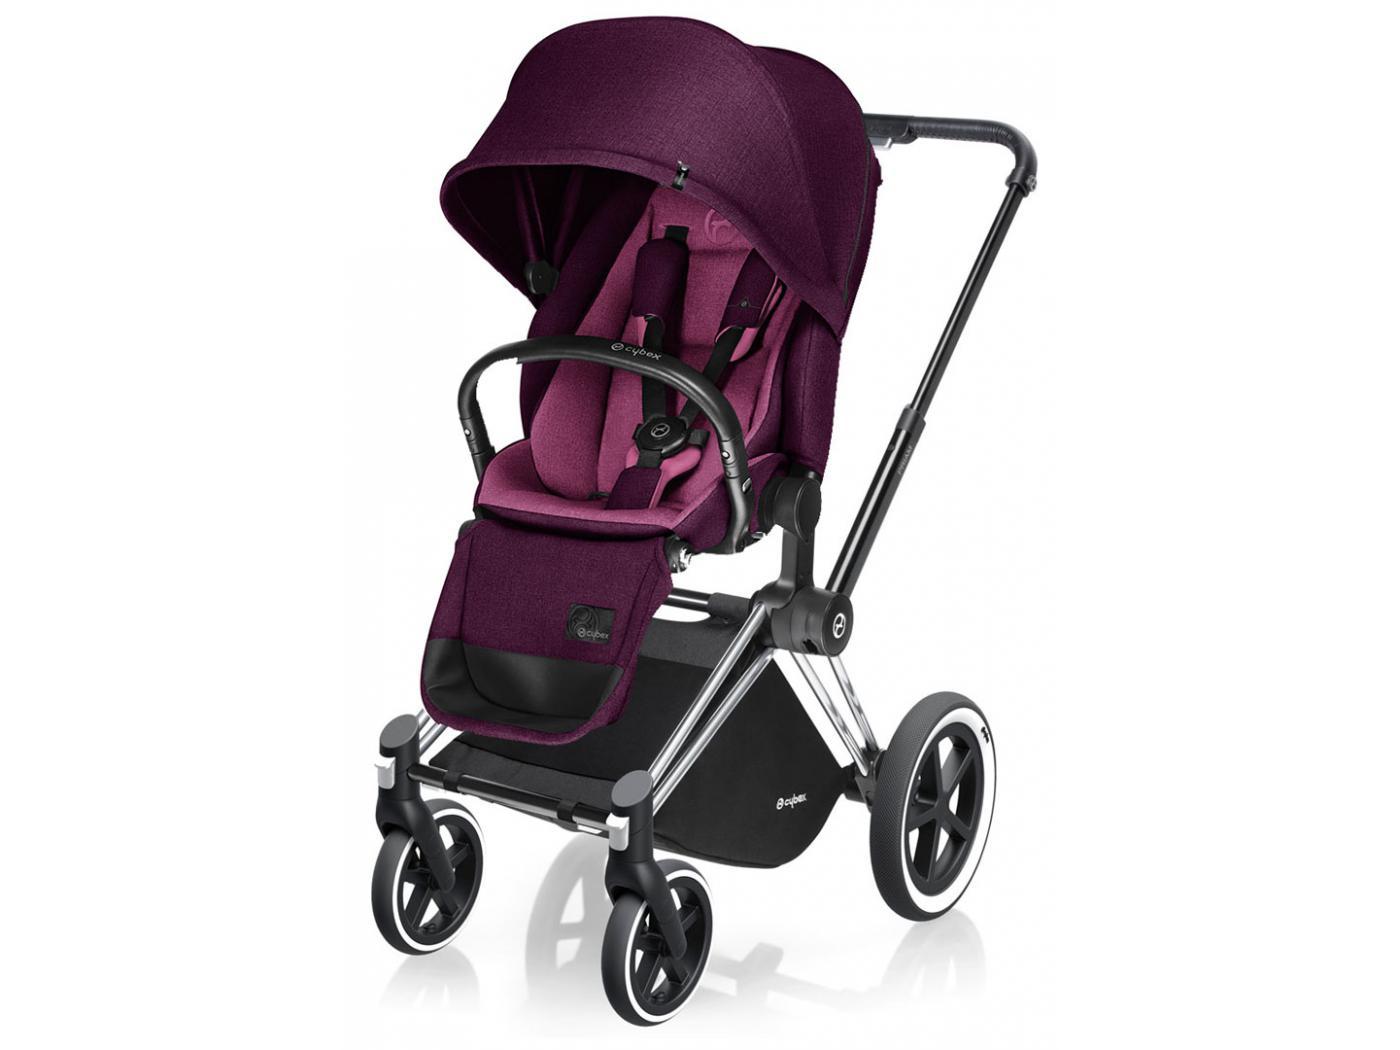 poussette priam chrome luxe mystic pink purple roues. Black Bedroom Furniture Sets. Home Design Ideas